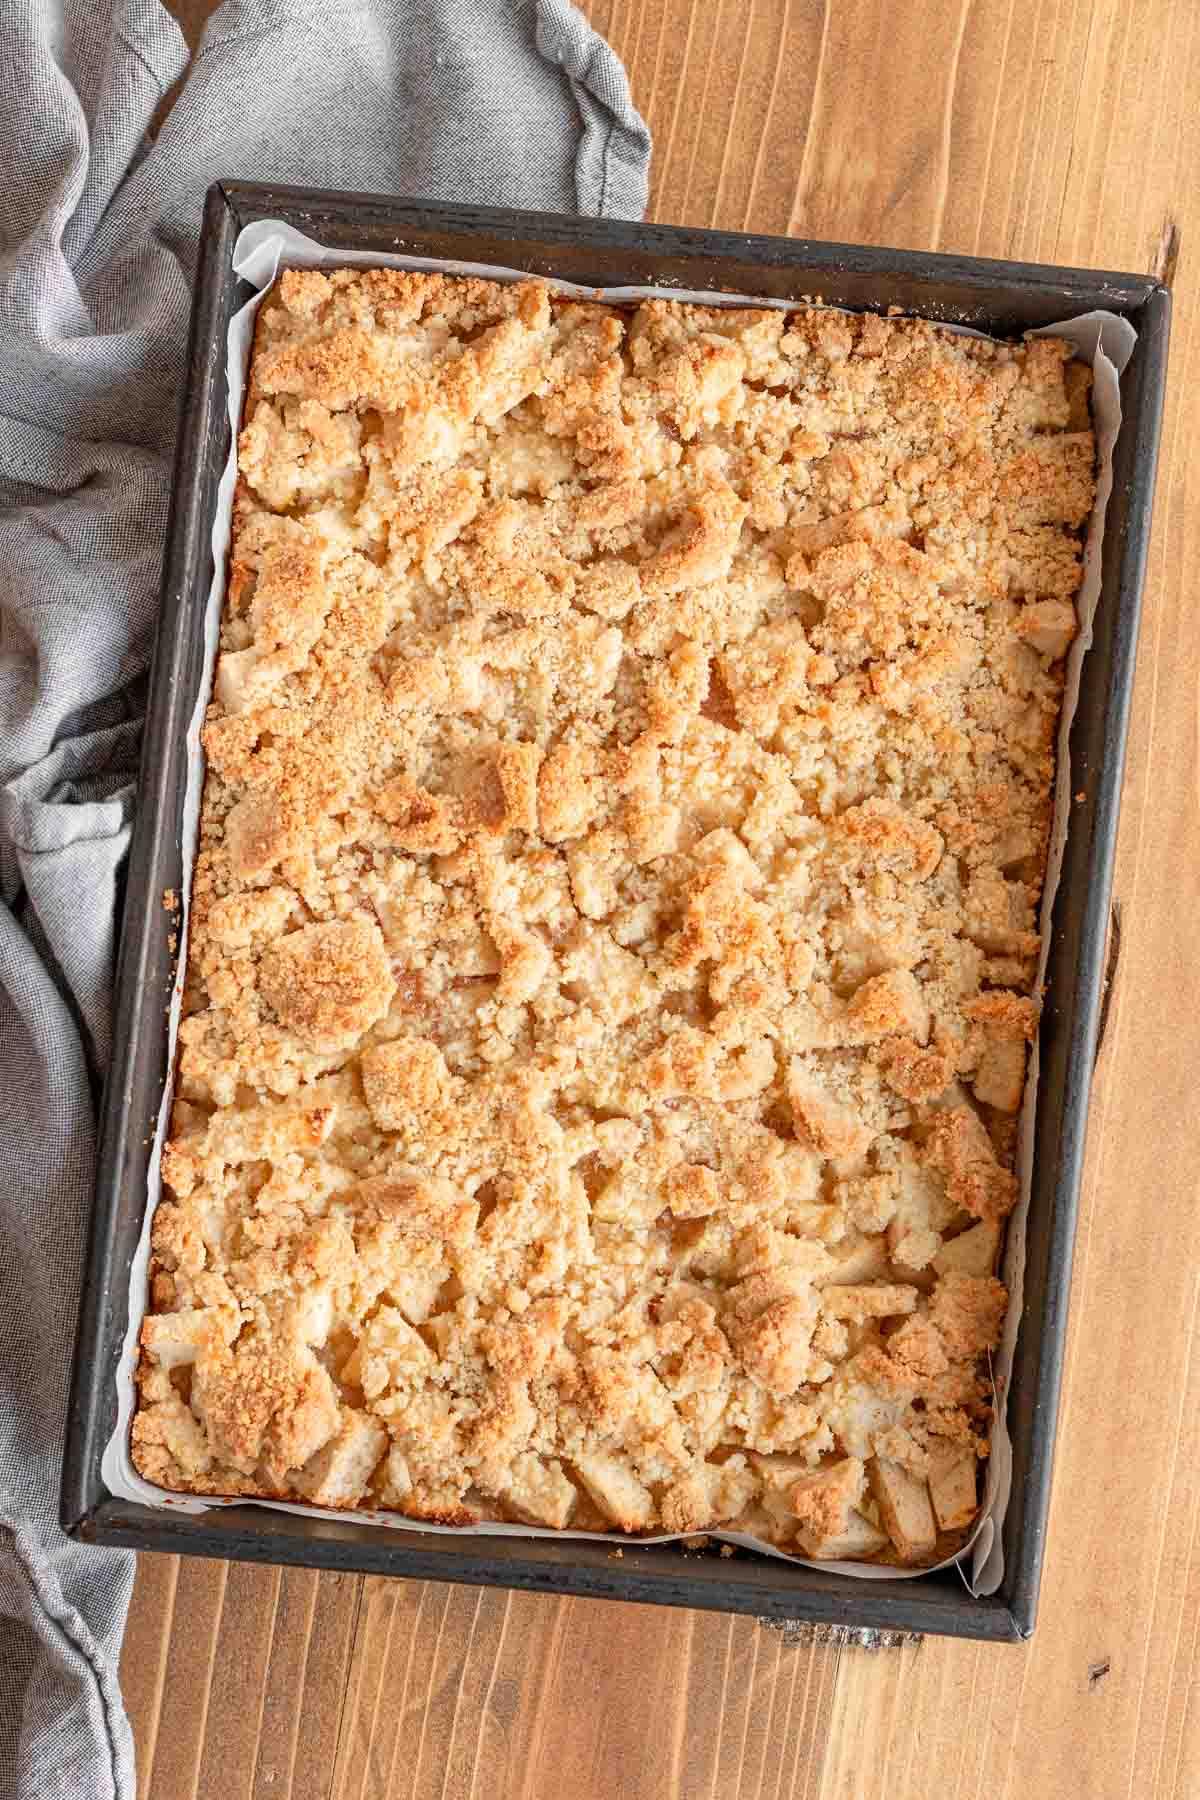 Baked Apple Crumb Bars in baking dish